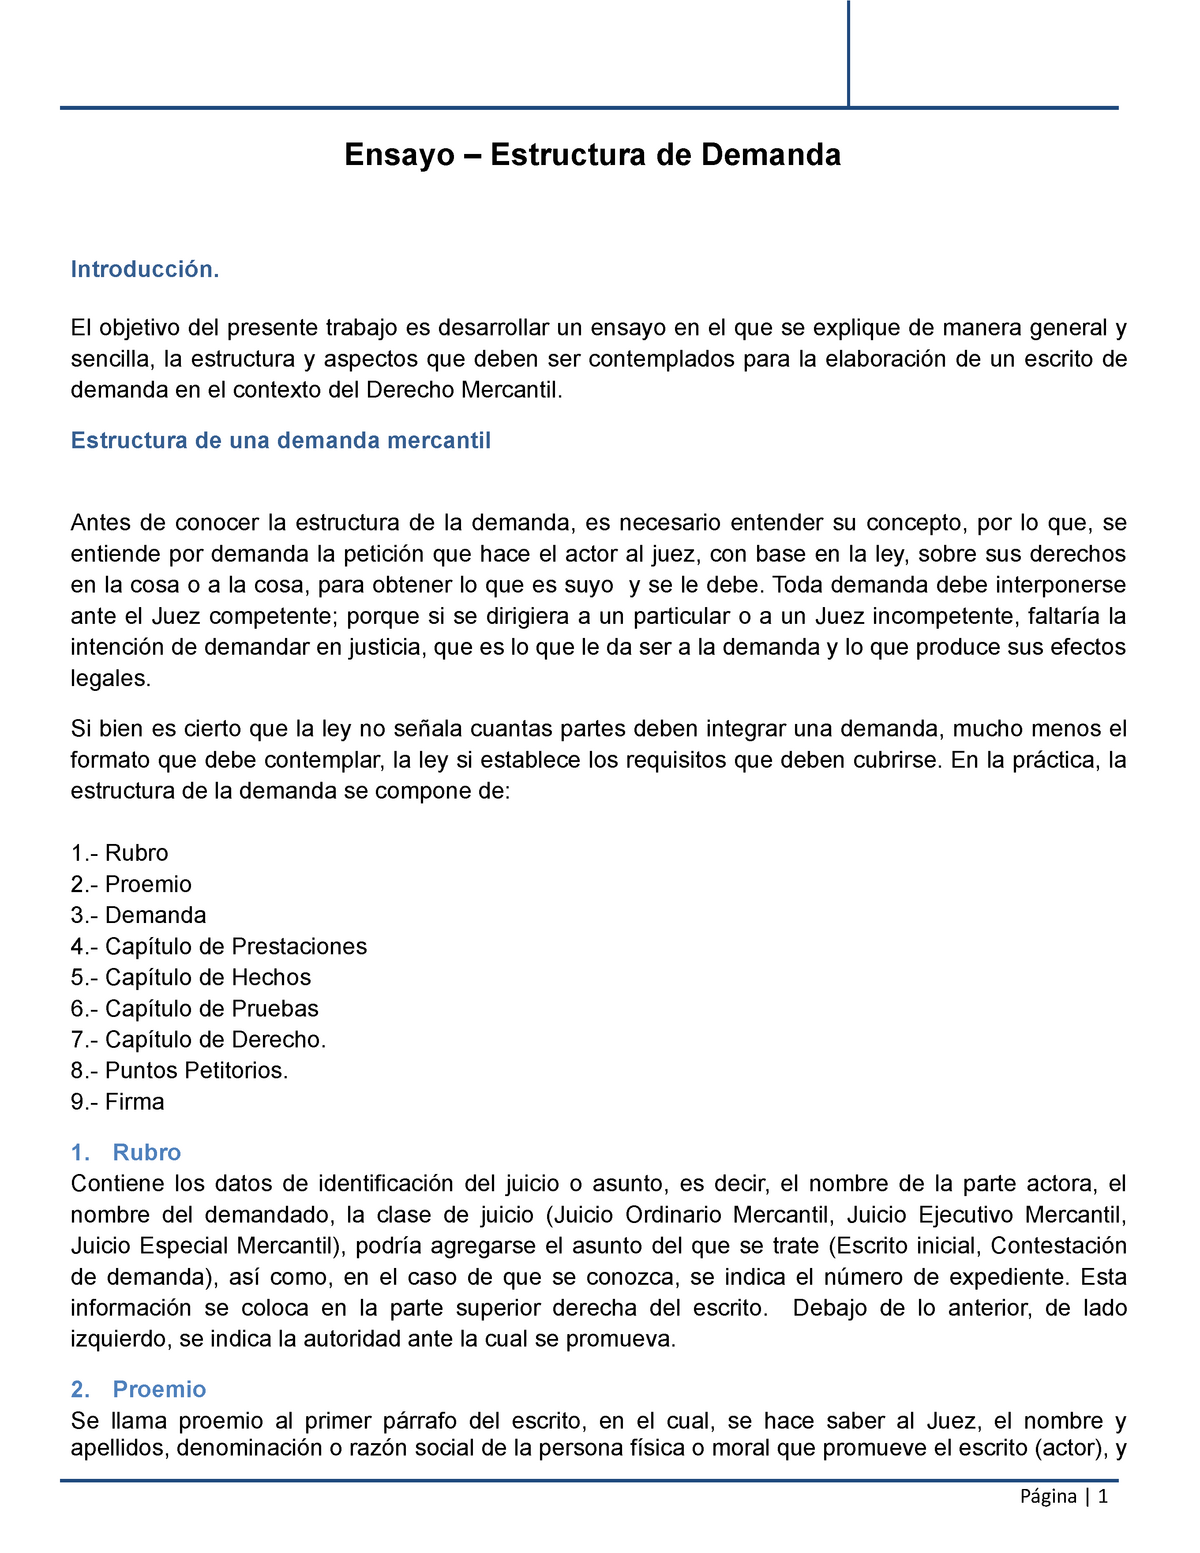 Estructura Demanda Apuntes Derecho Uvm Studocu